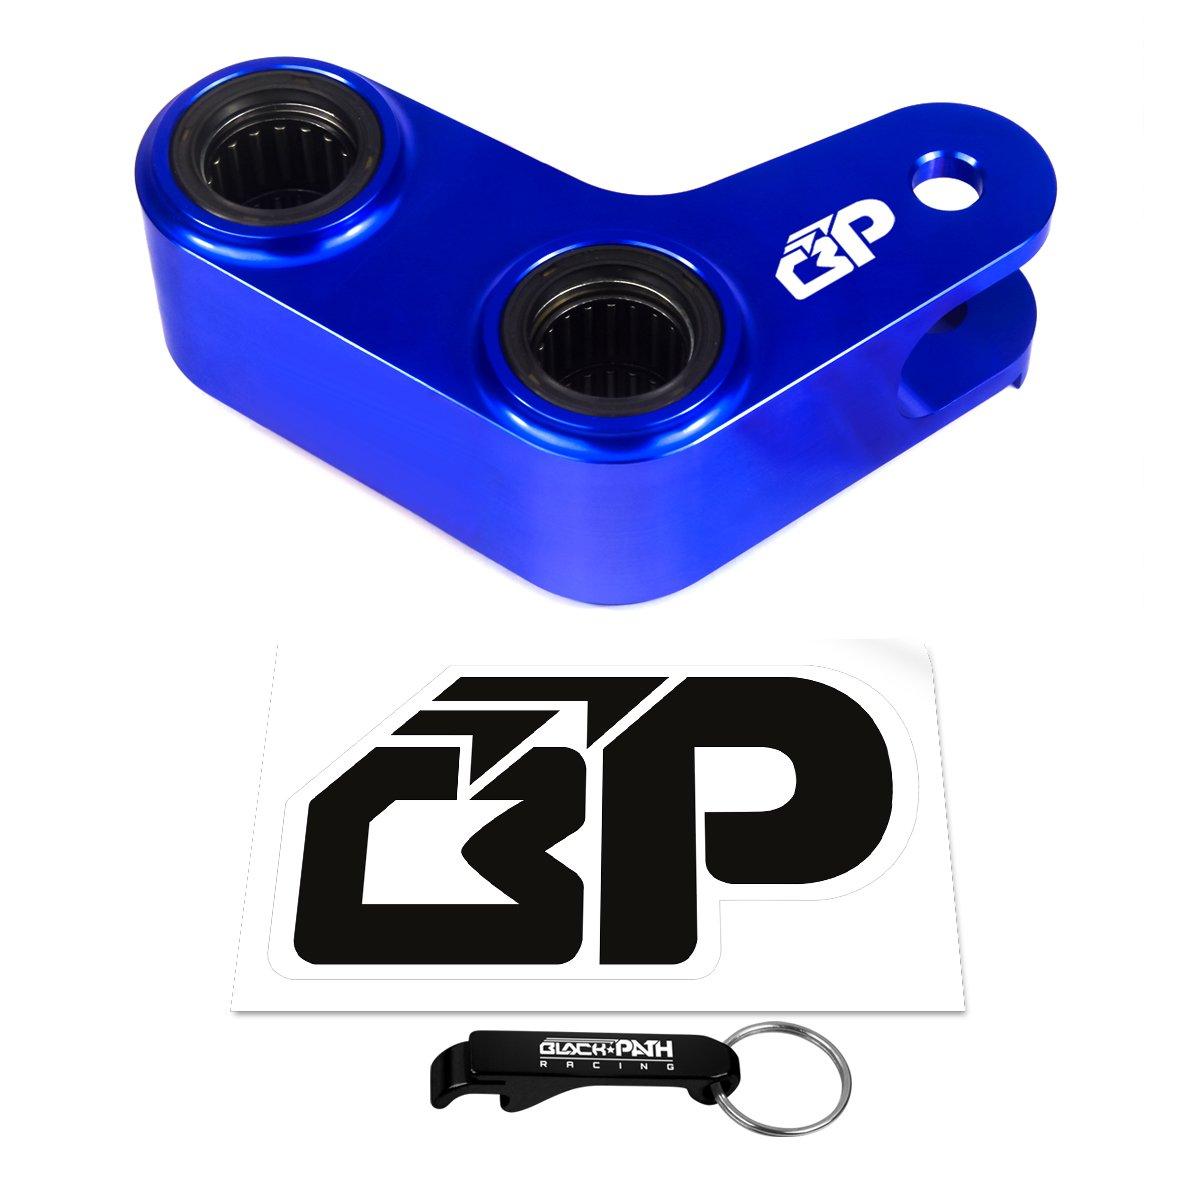 BlackPath - Yamaha 1.5 Inch Adjustable Rear Lowering Link Kit YZ400 + YZ426F + YZ450F + WR250F + WR450F Motorcycle Drop Links (Blue) T6 Billet by Black Path